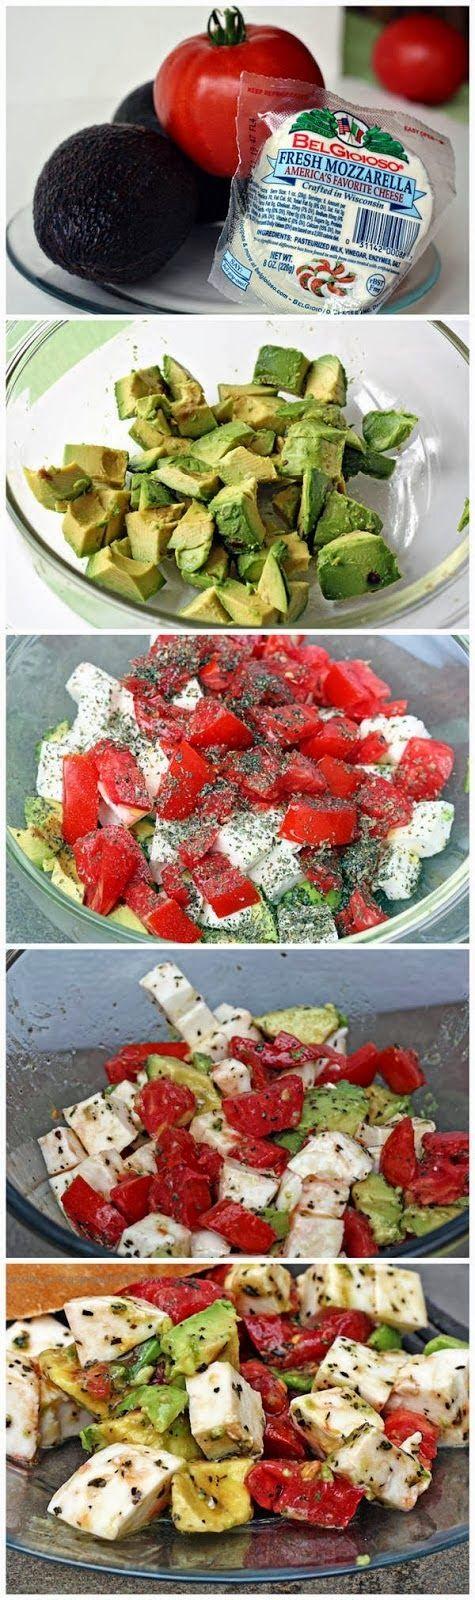 Mozzarella Salad Avocado / Tomato, I could live on this